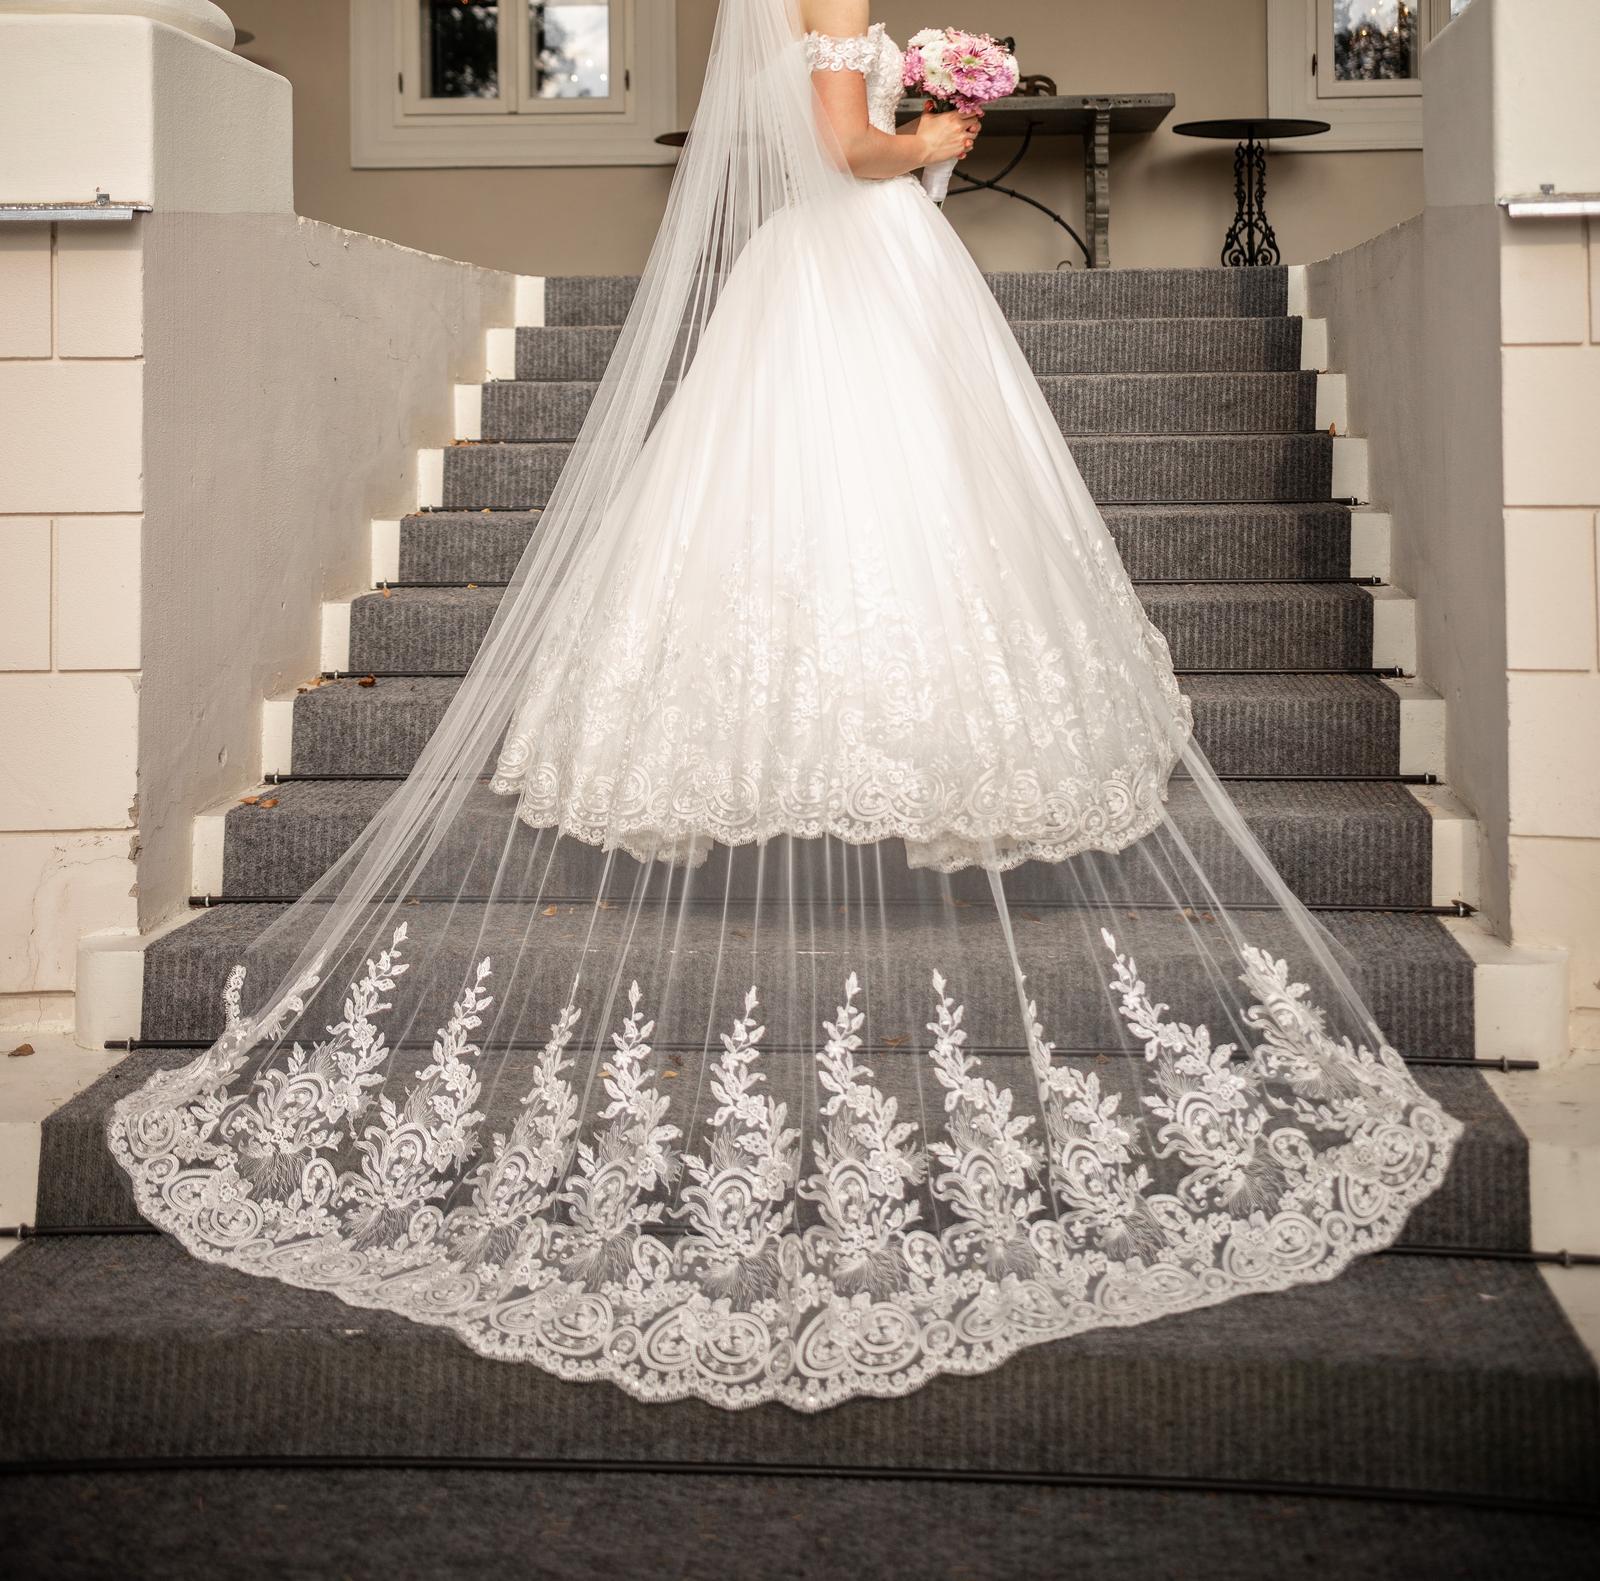 Nádherné svadobné šaty - Obrázok č. 1